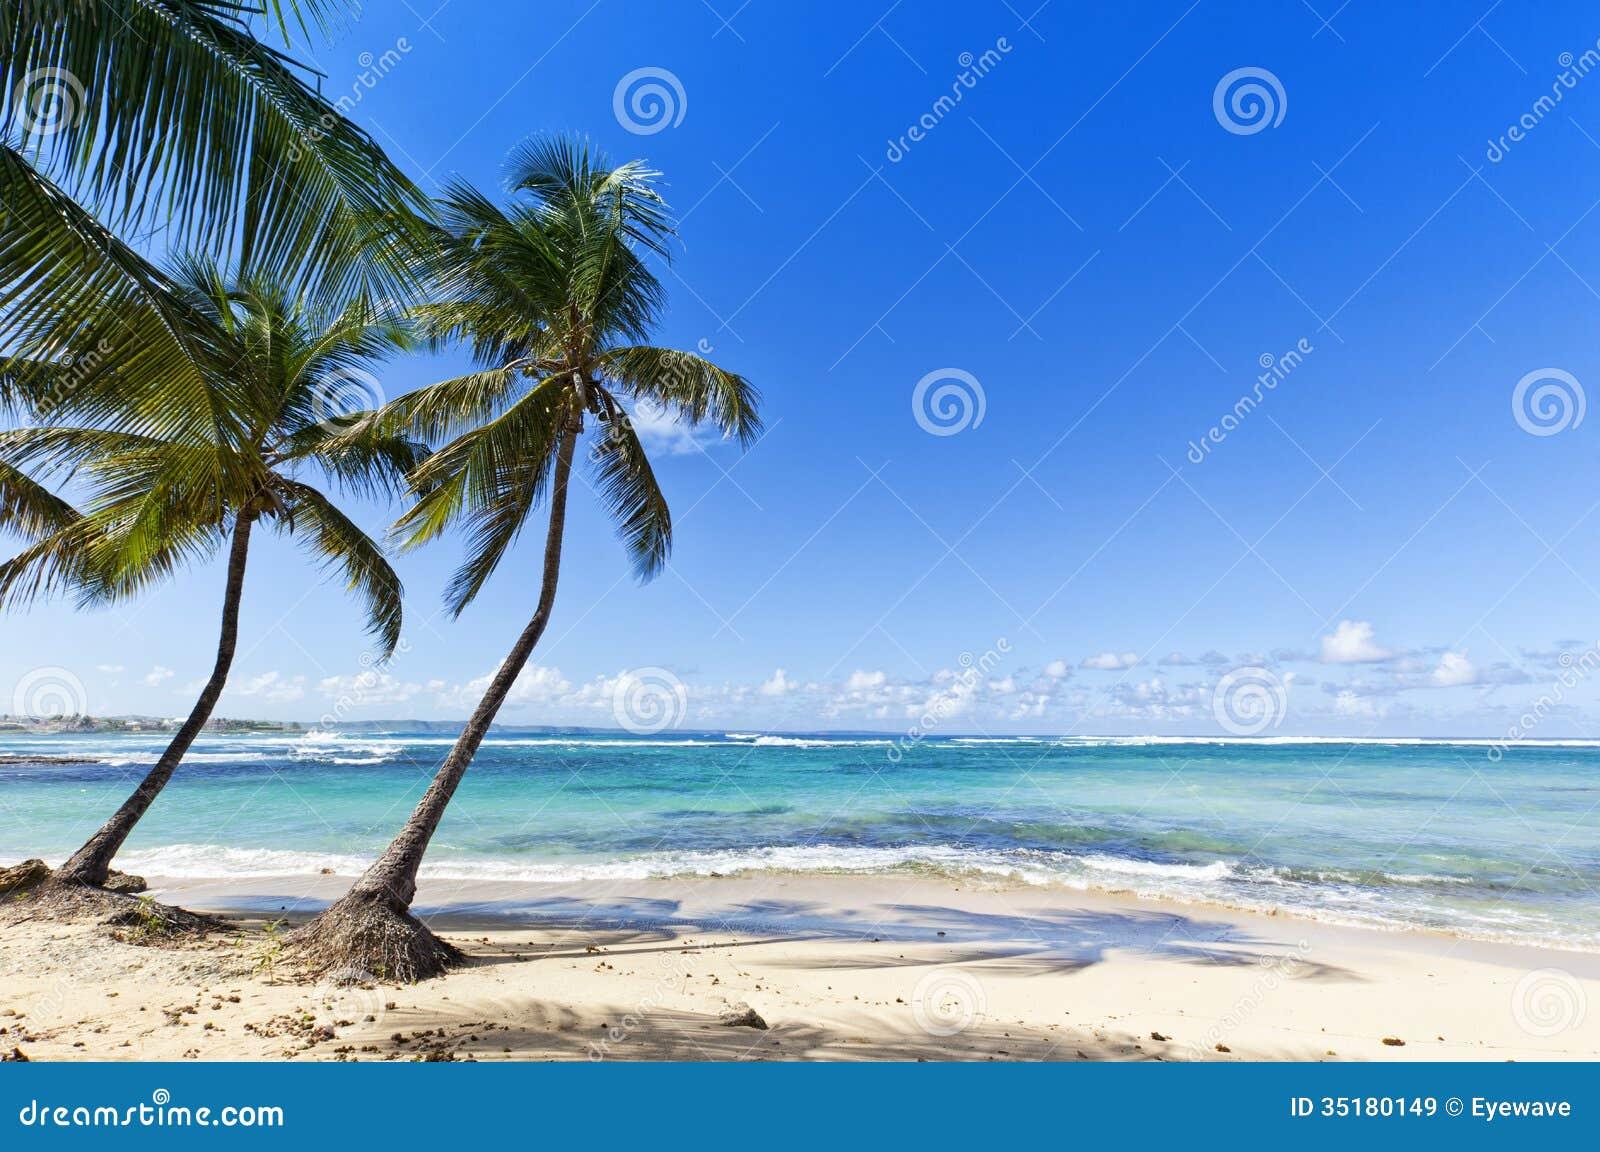 Guadalupe Island Beaches